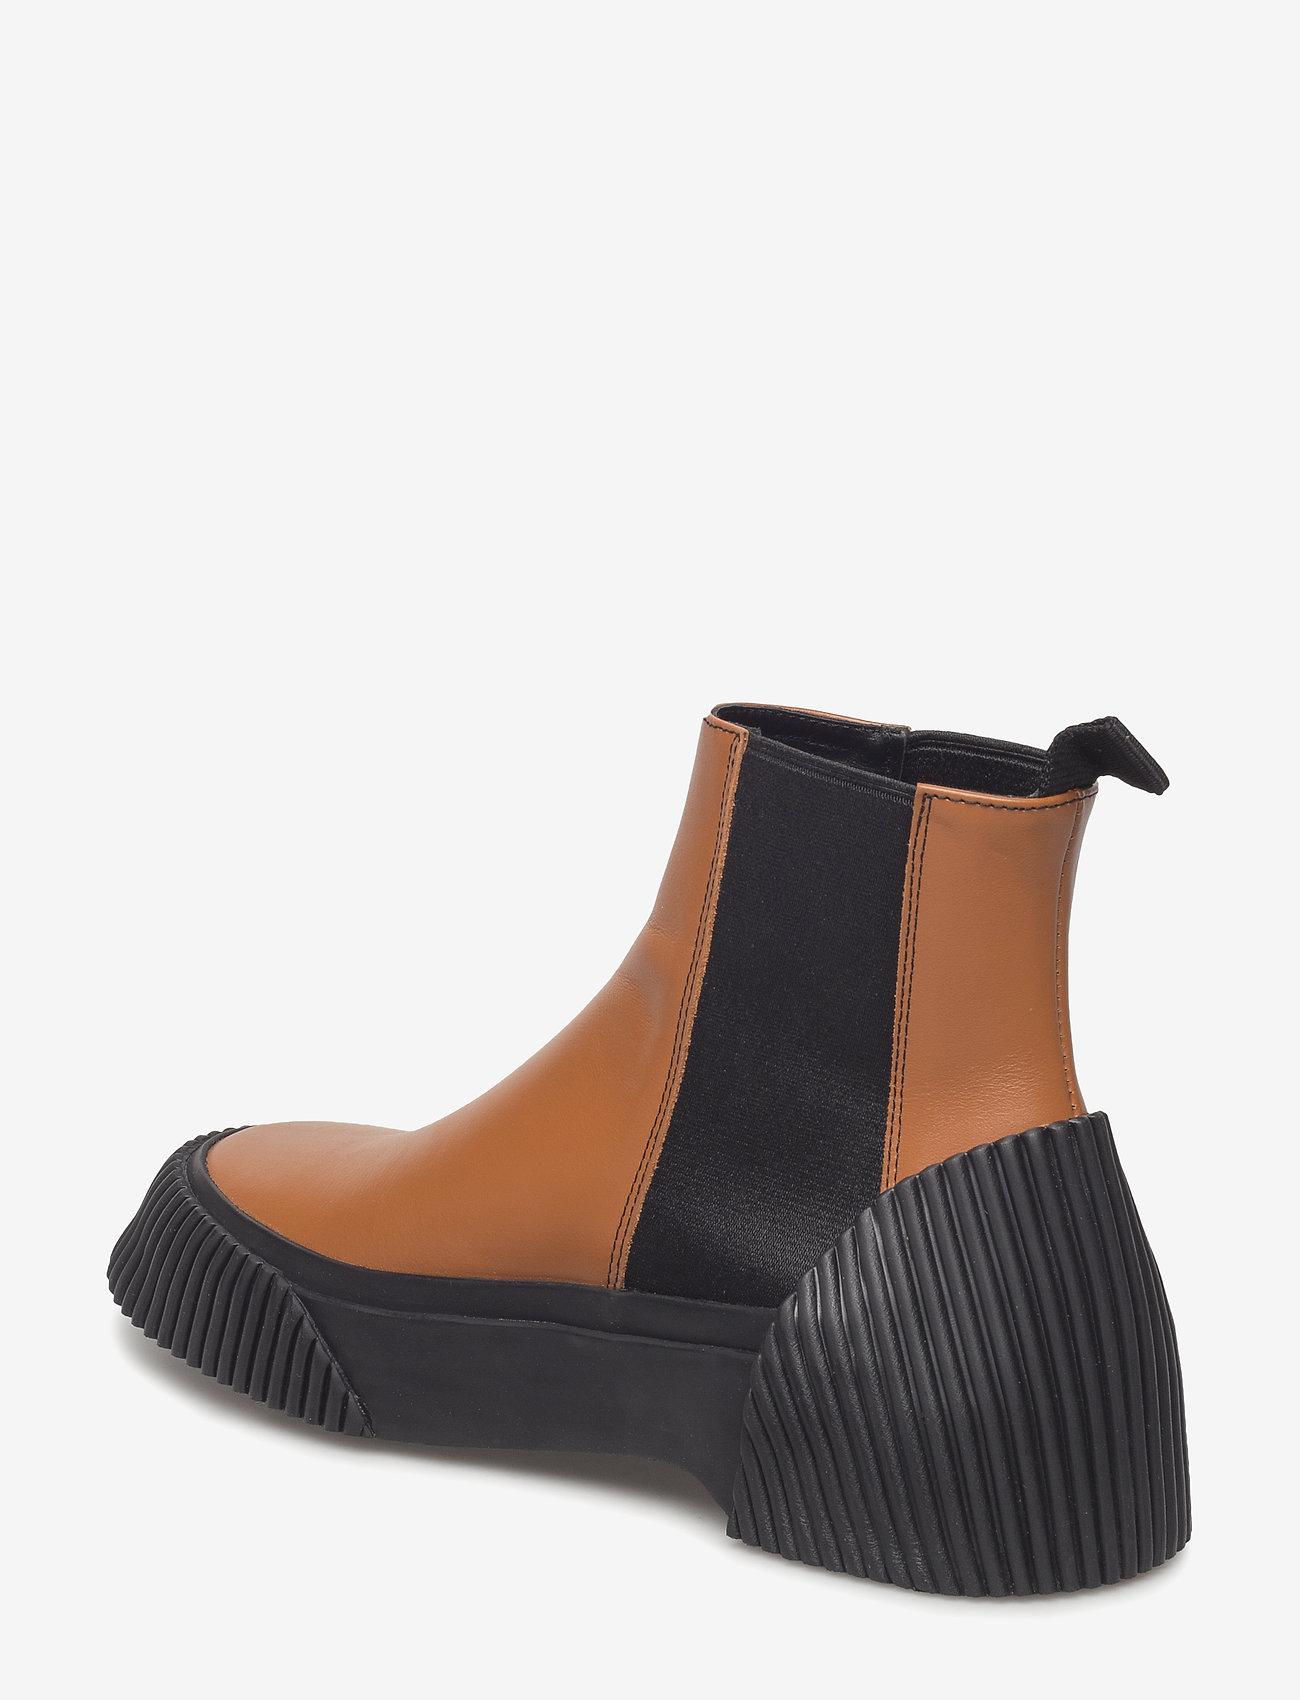 Lela - Vulcanized Chelsea Boot (Cognac) - 3.1 Phillip Lim